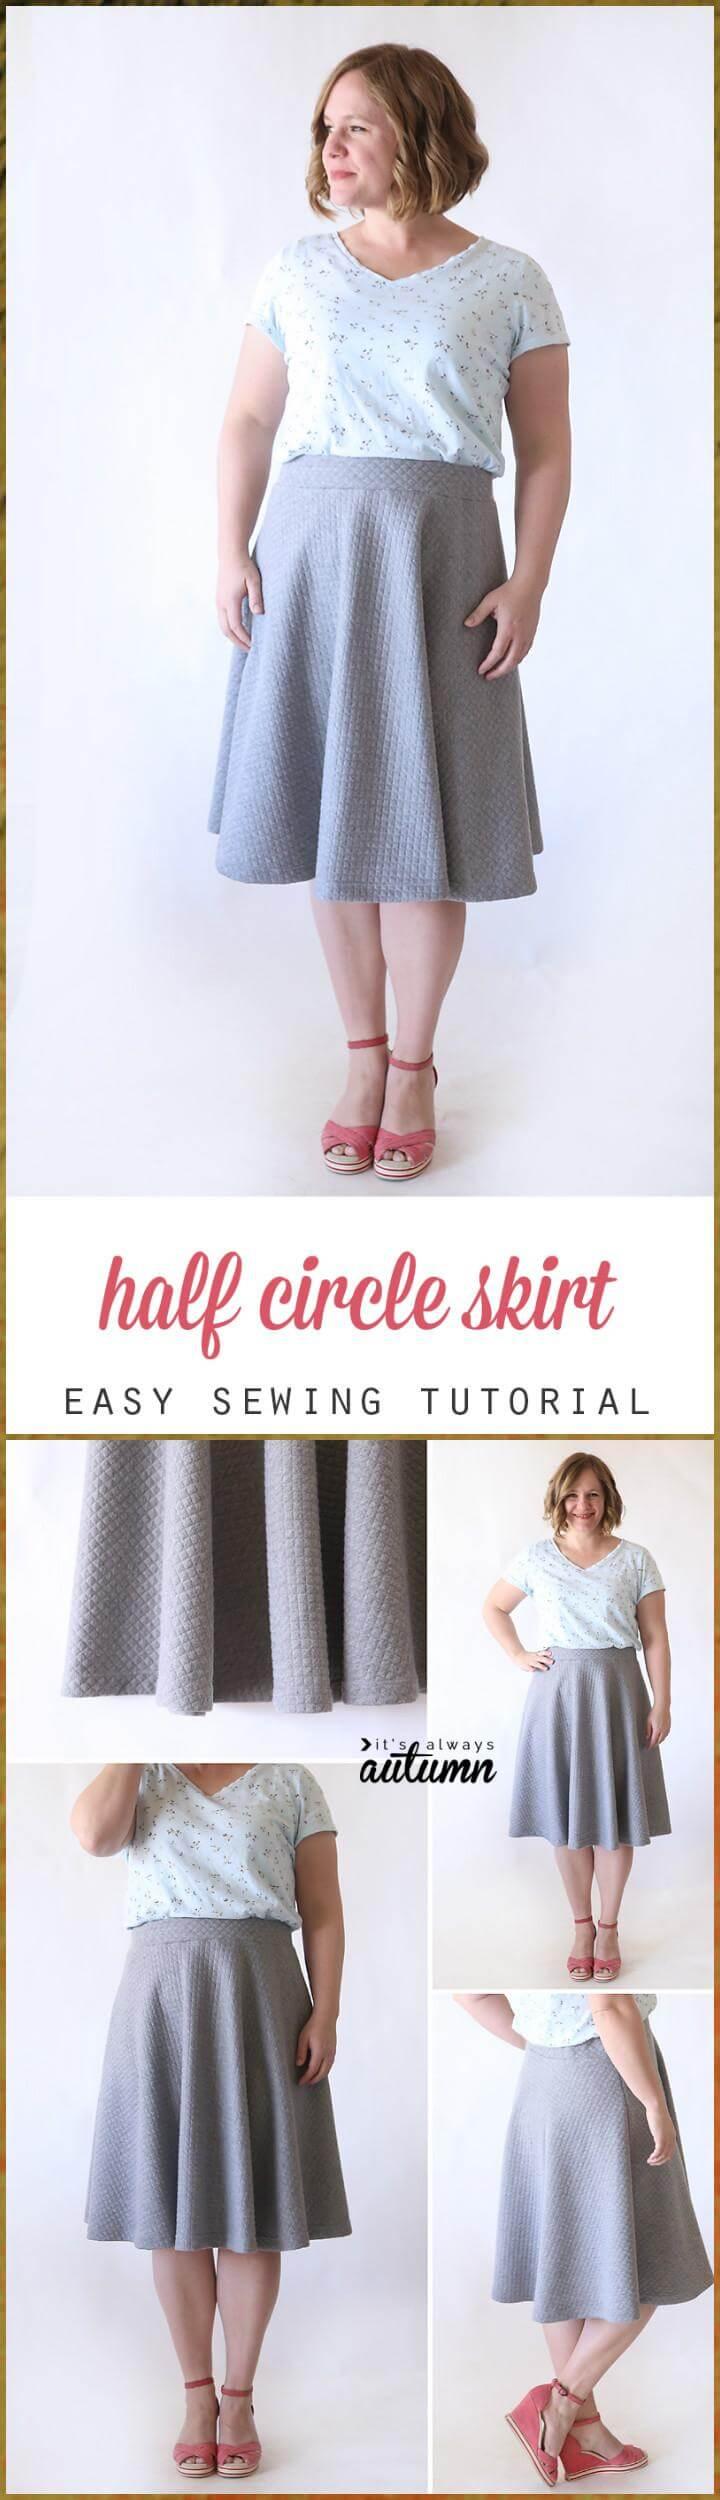 DIY super easy half circle skirt sewing tutorial